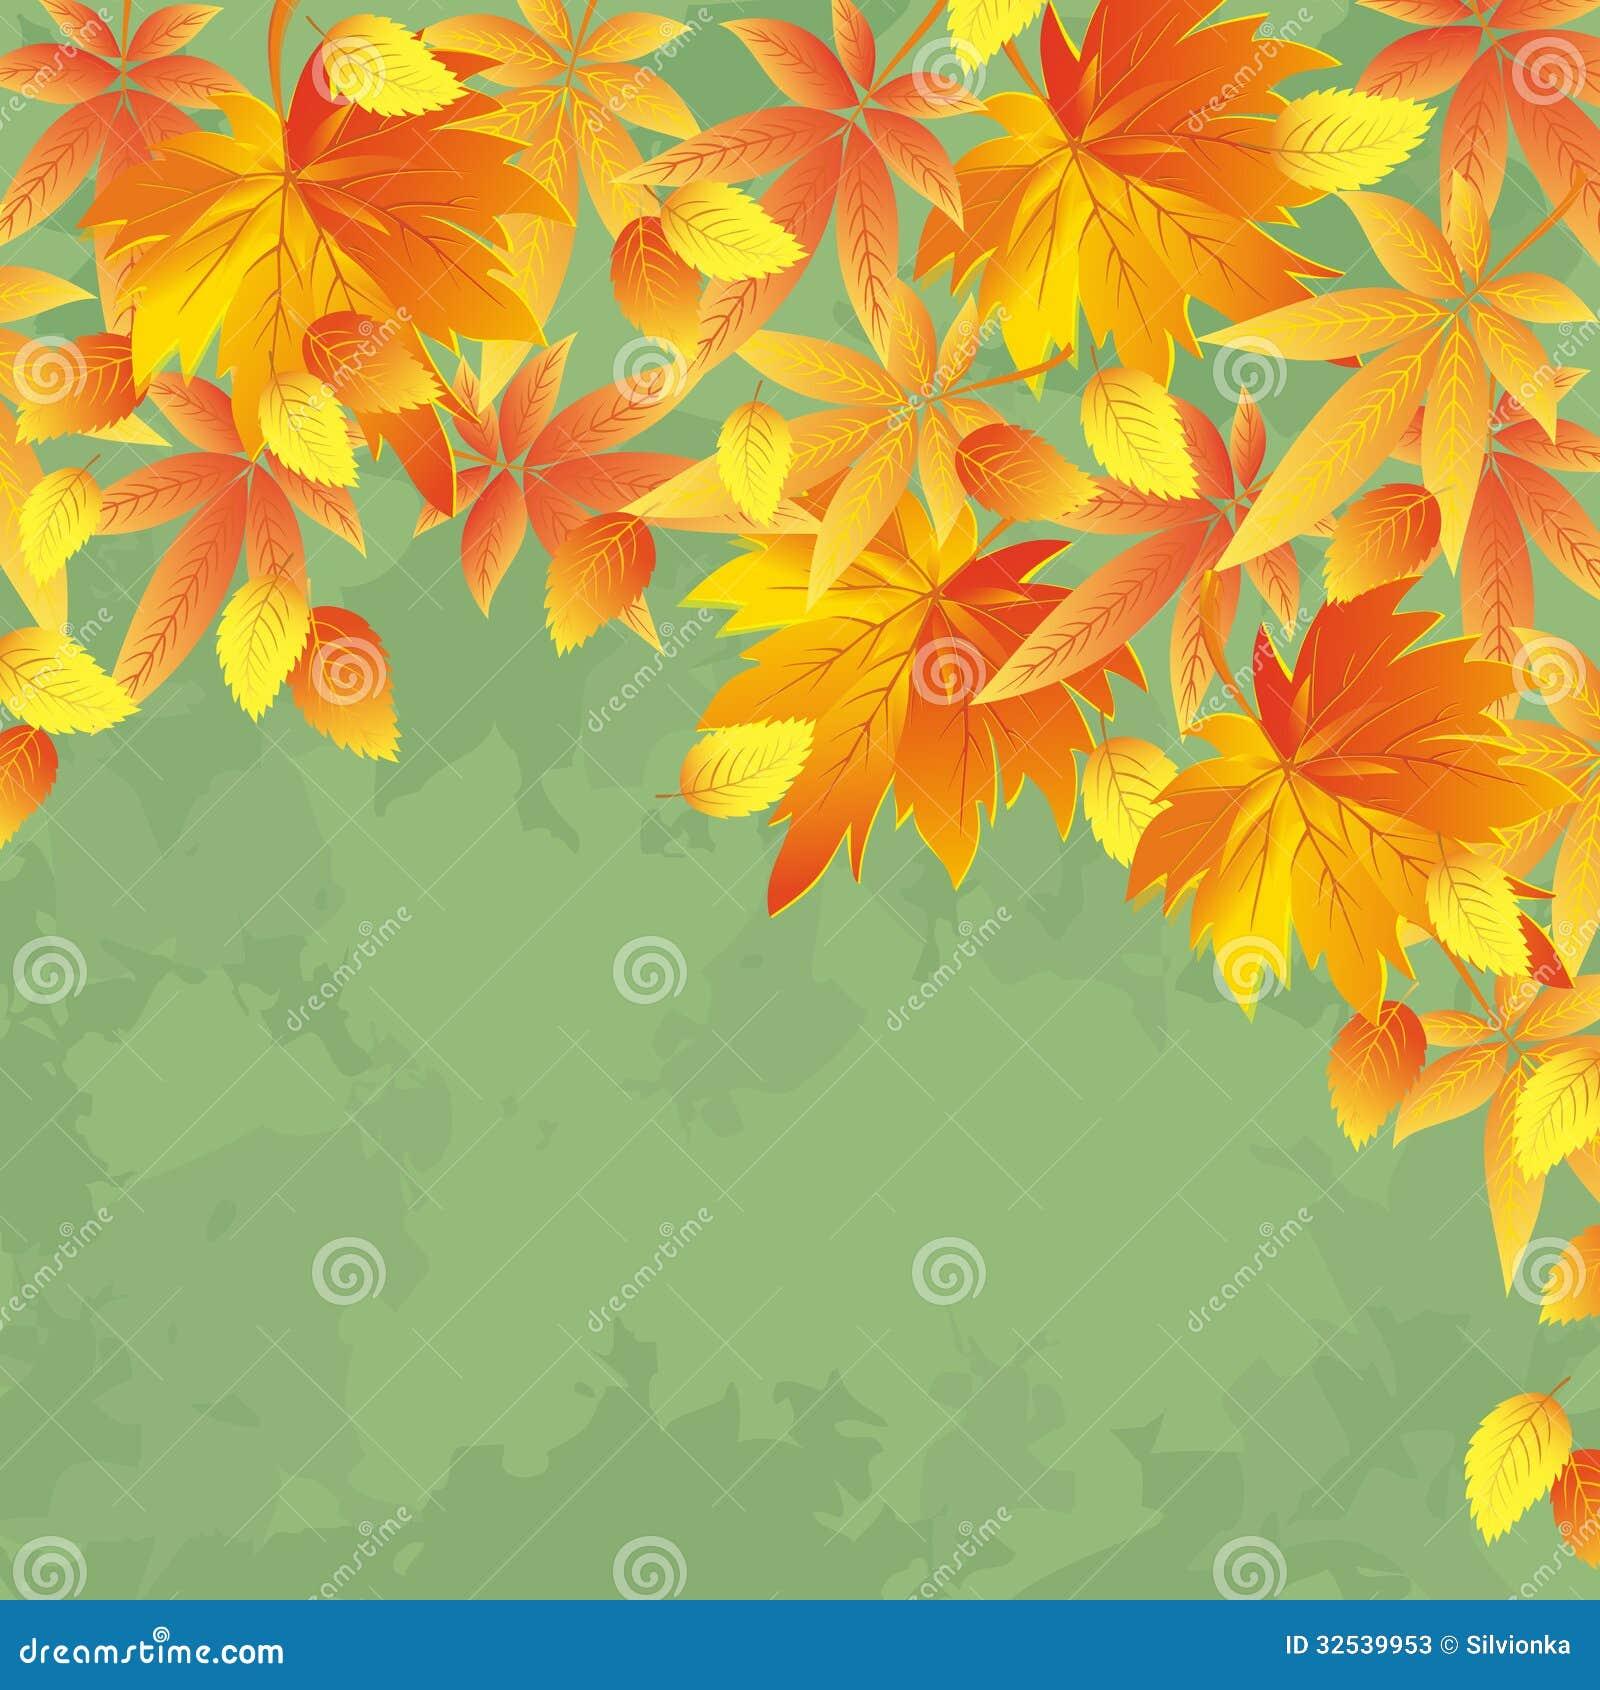 Vintage Autumn Background, Leaf Fall Stock Photos - Image ...